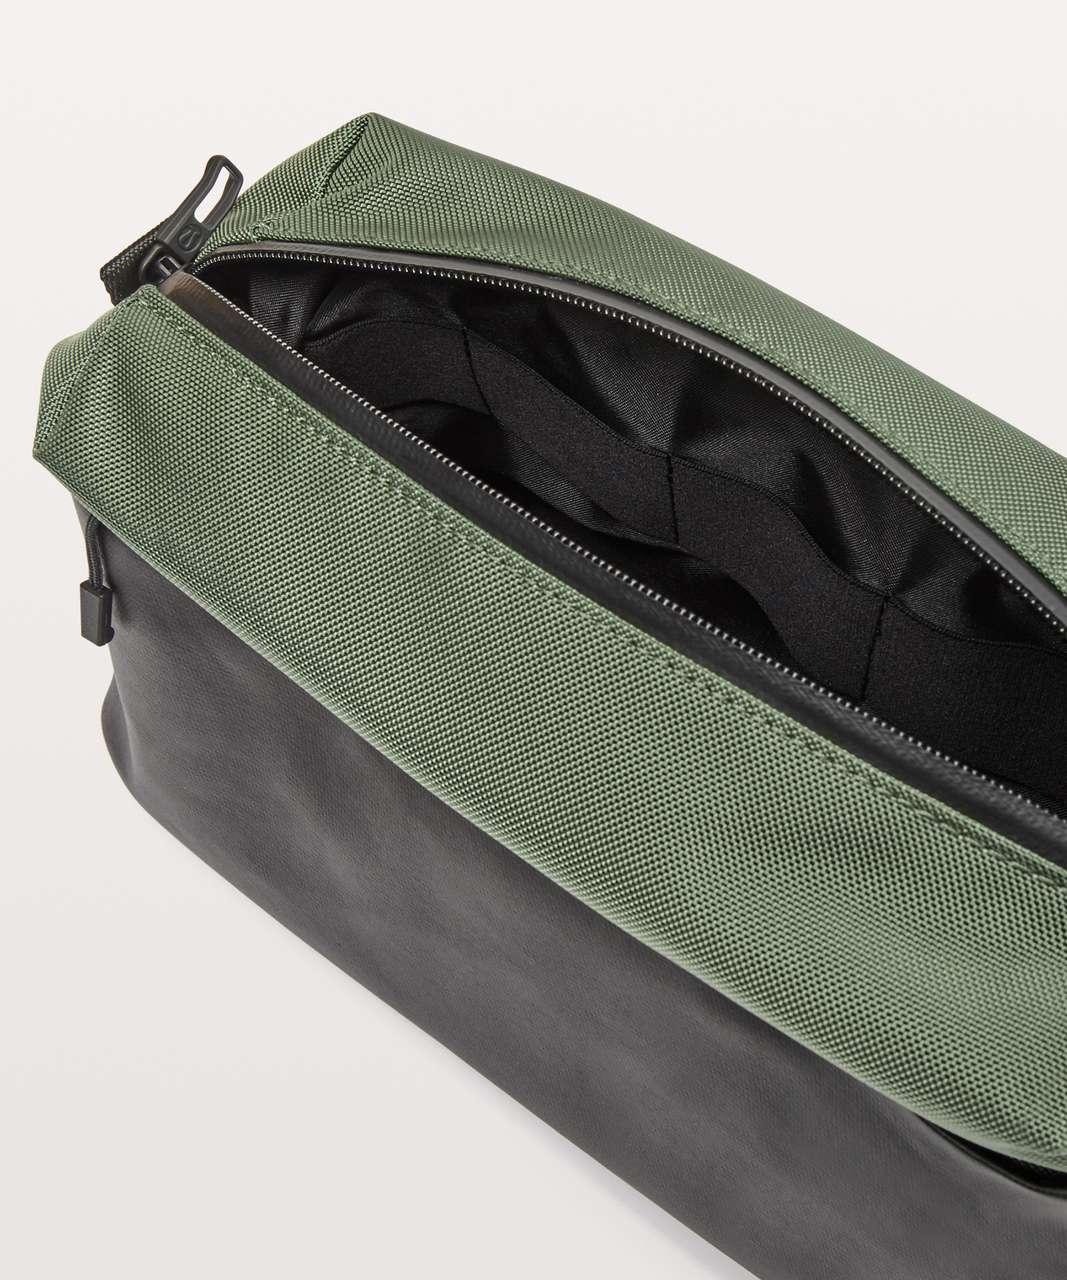 Lululemon Dual Duty Dopp Kit *6L - Green Twill